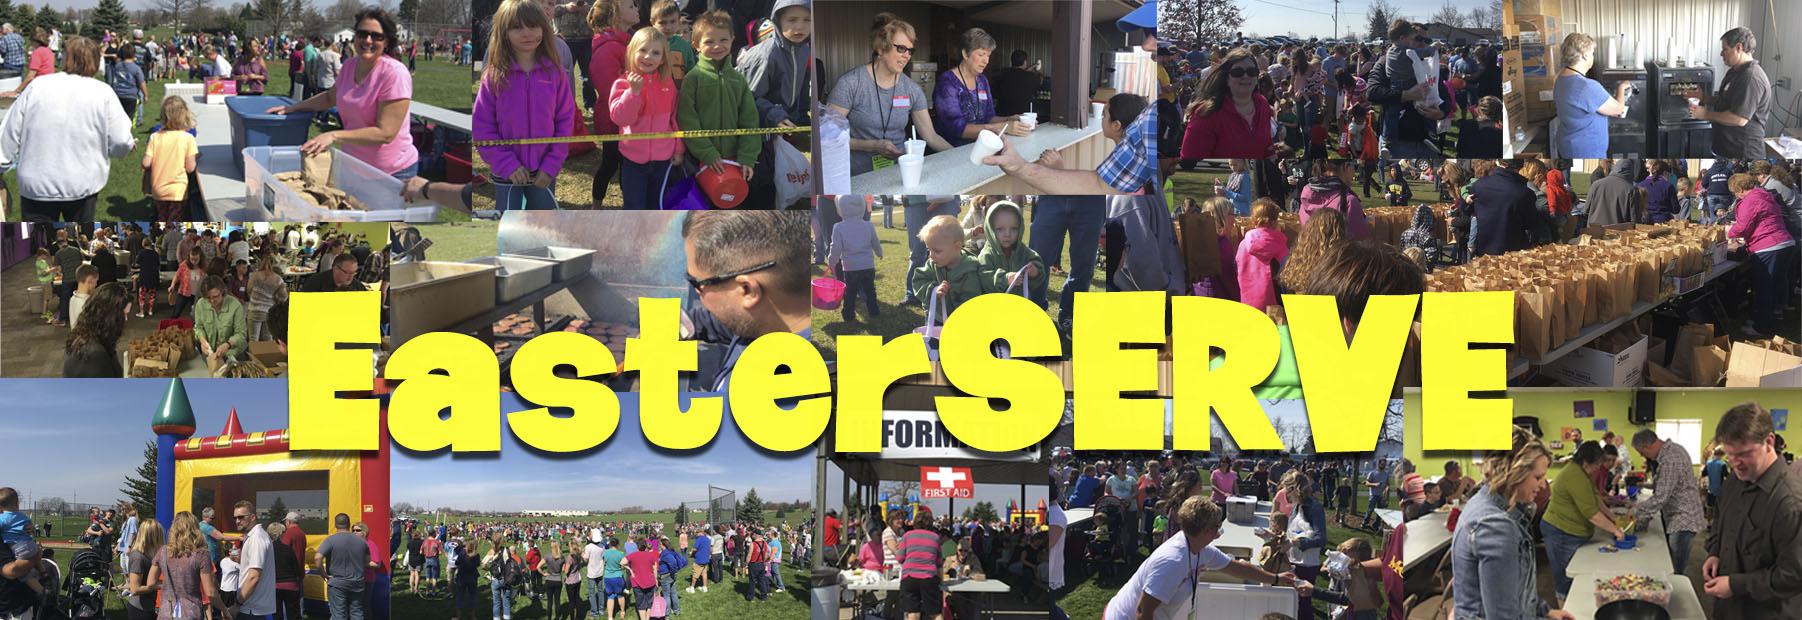 EasterSERVE collage_edited-2.jpg